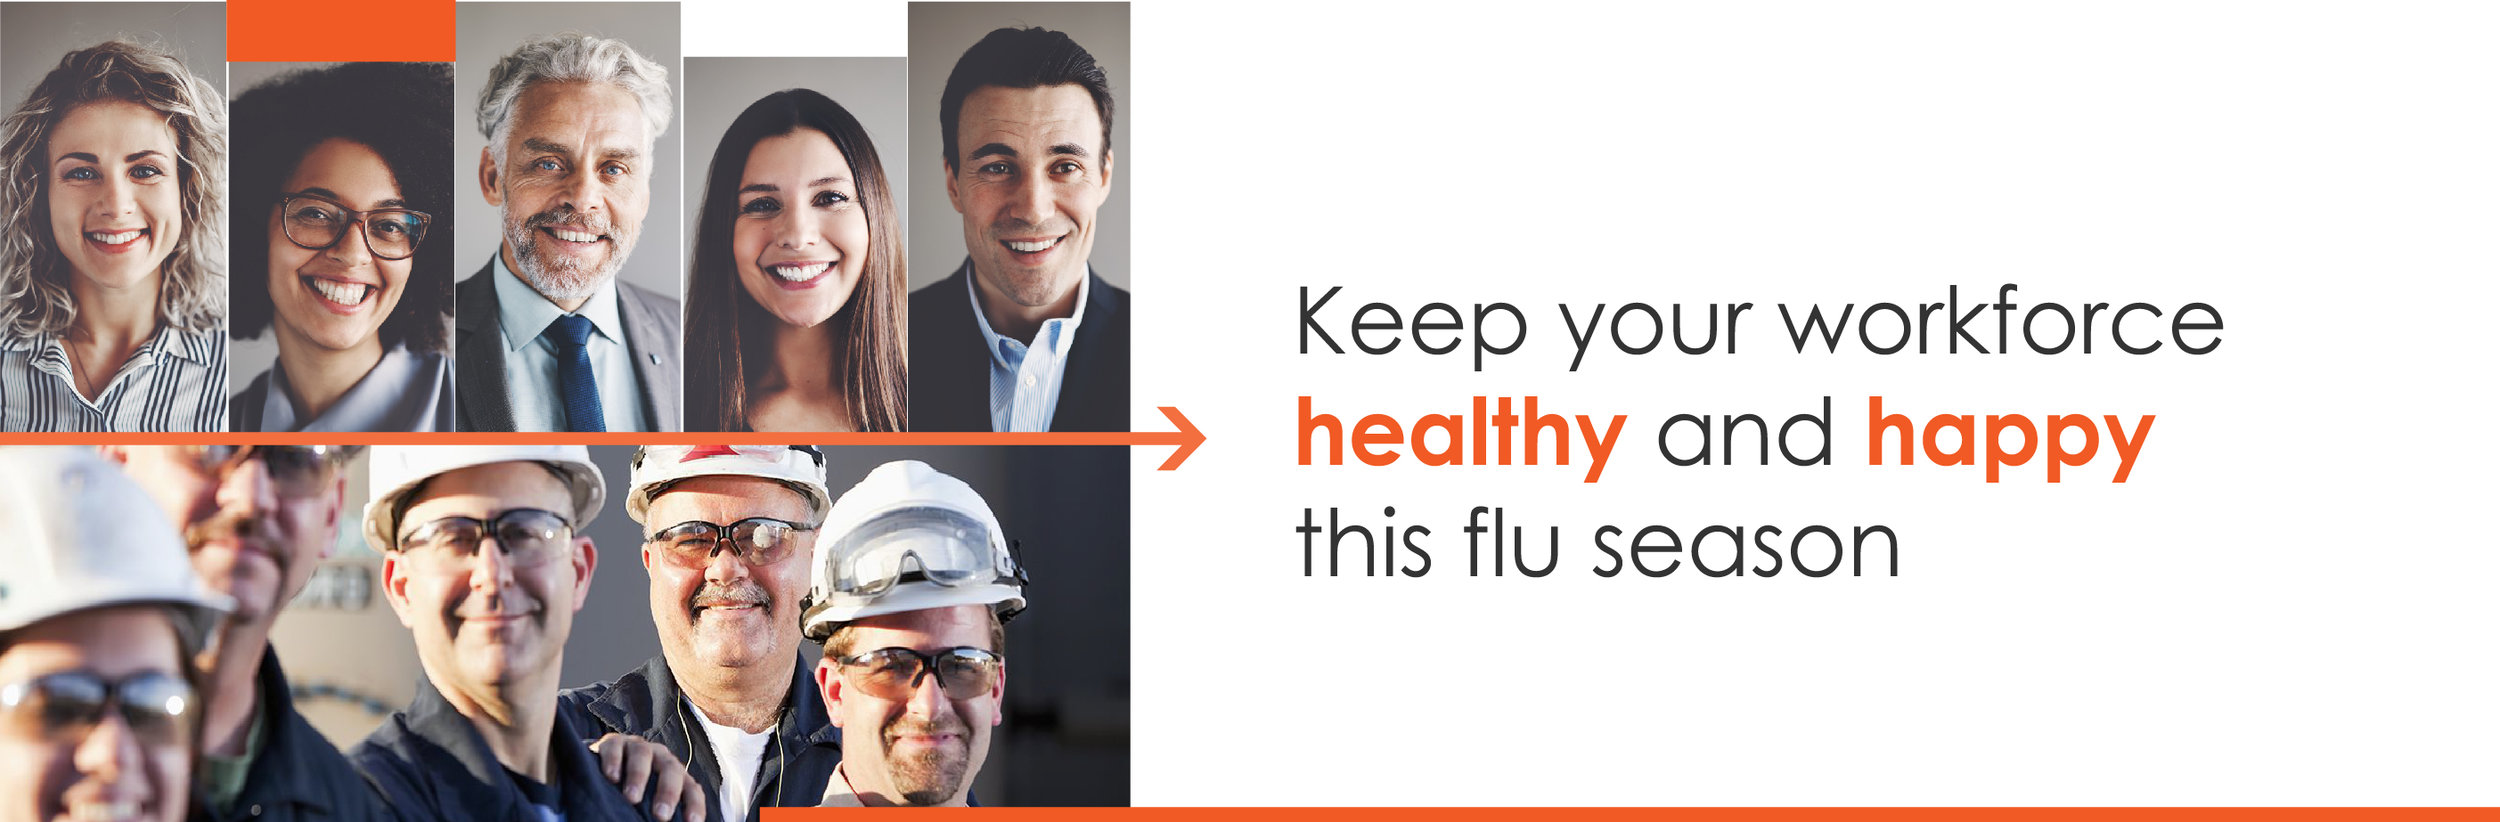 Worklplace On-site Flu Clinic